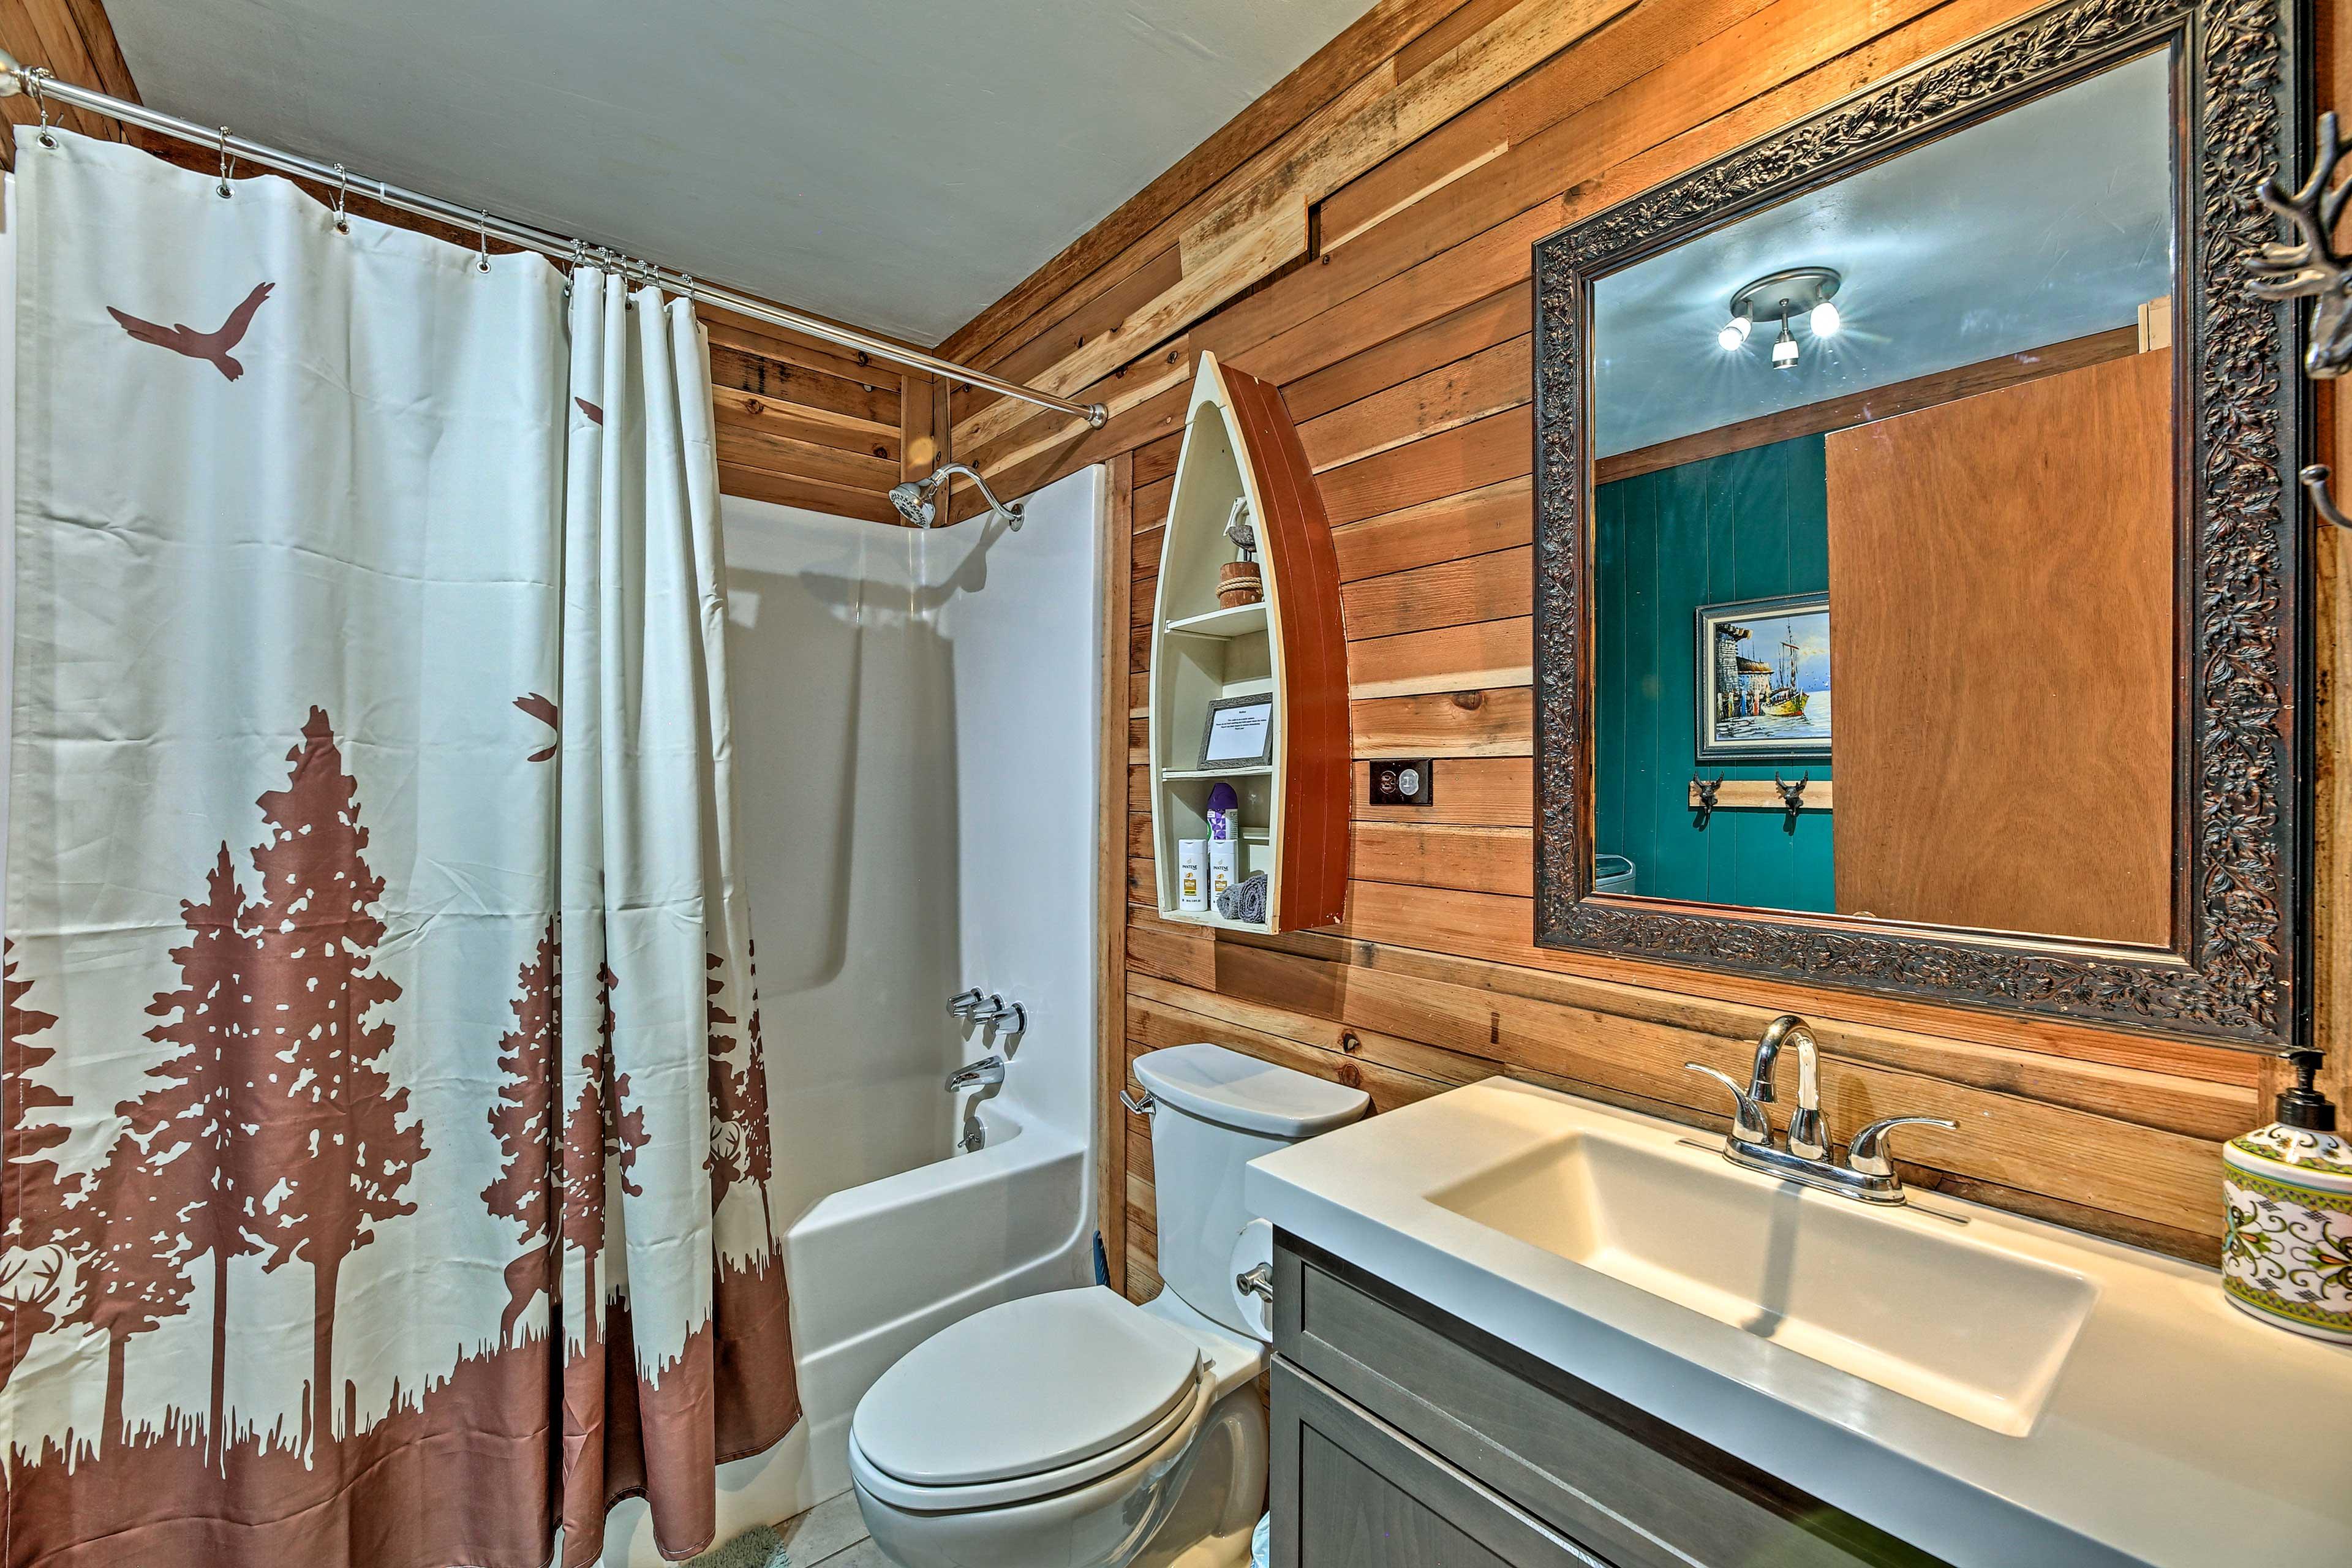 Bathroom | Towels Provided | Complimentary Toiletries | Hair Dryer